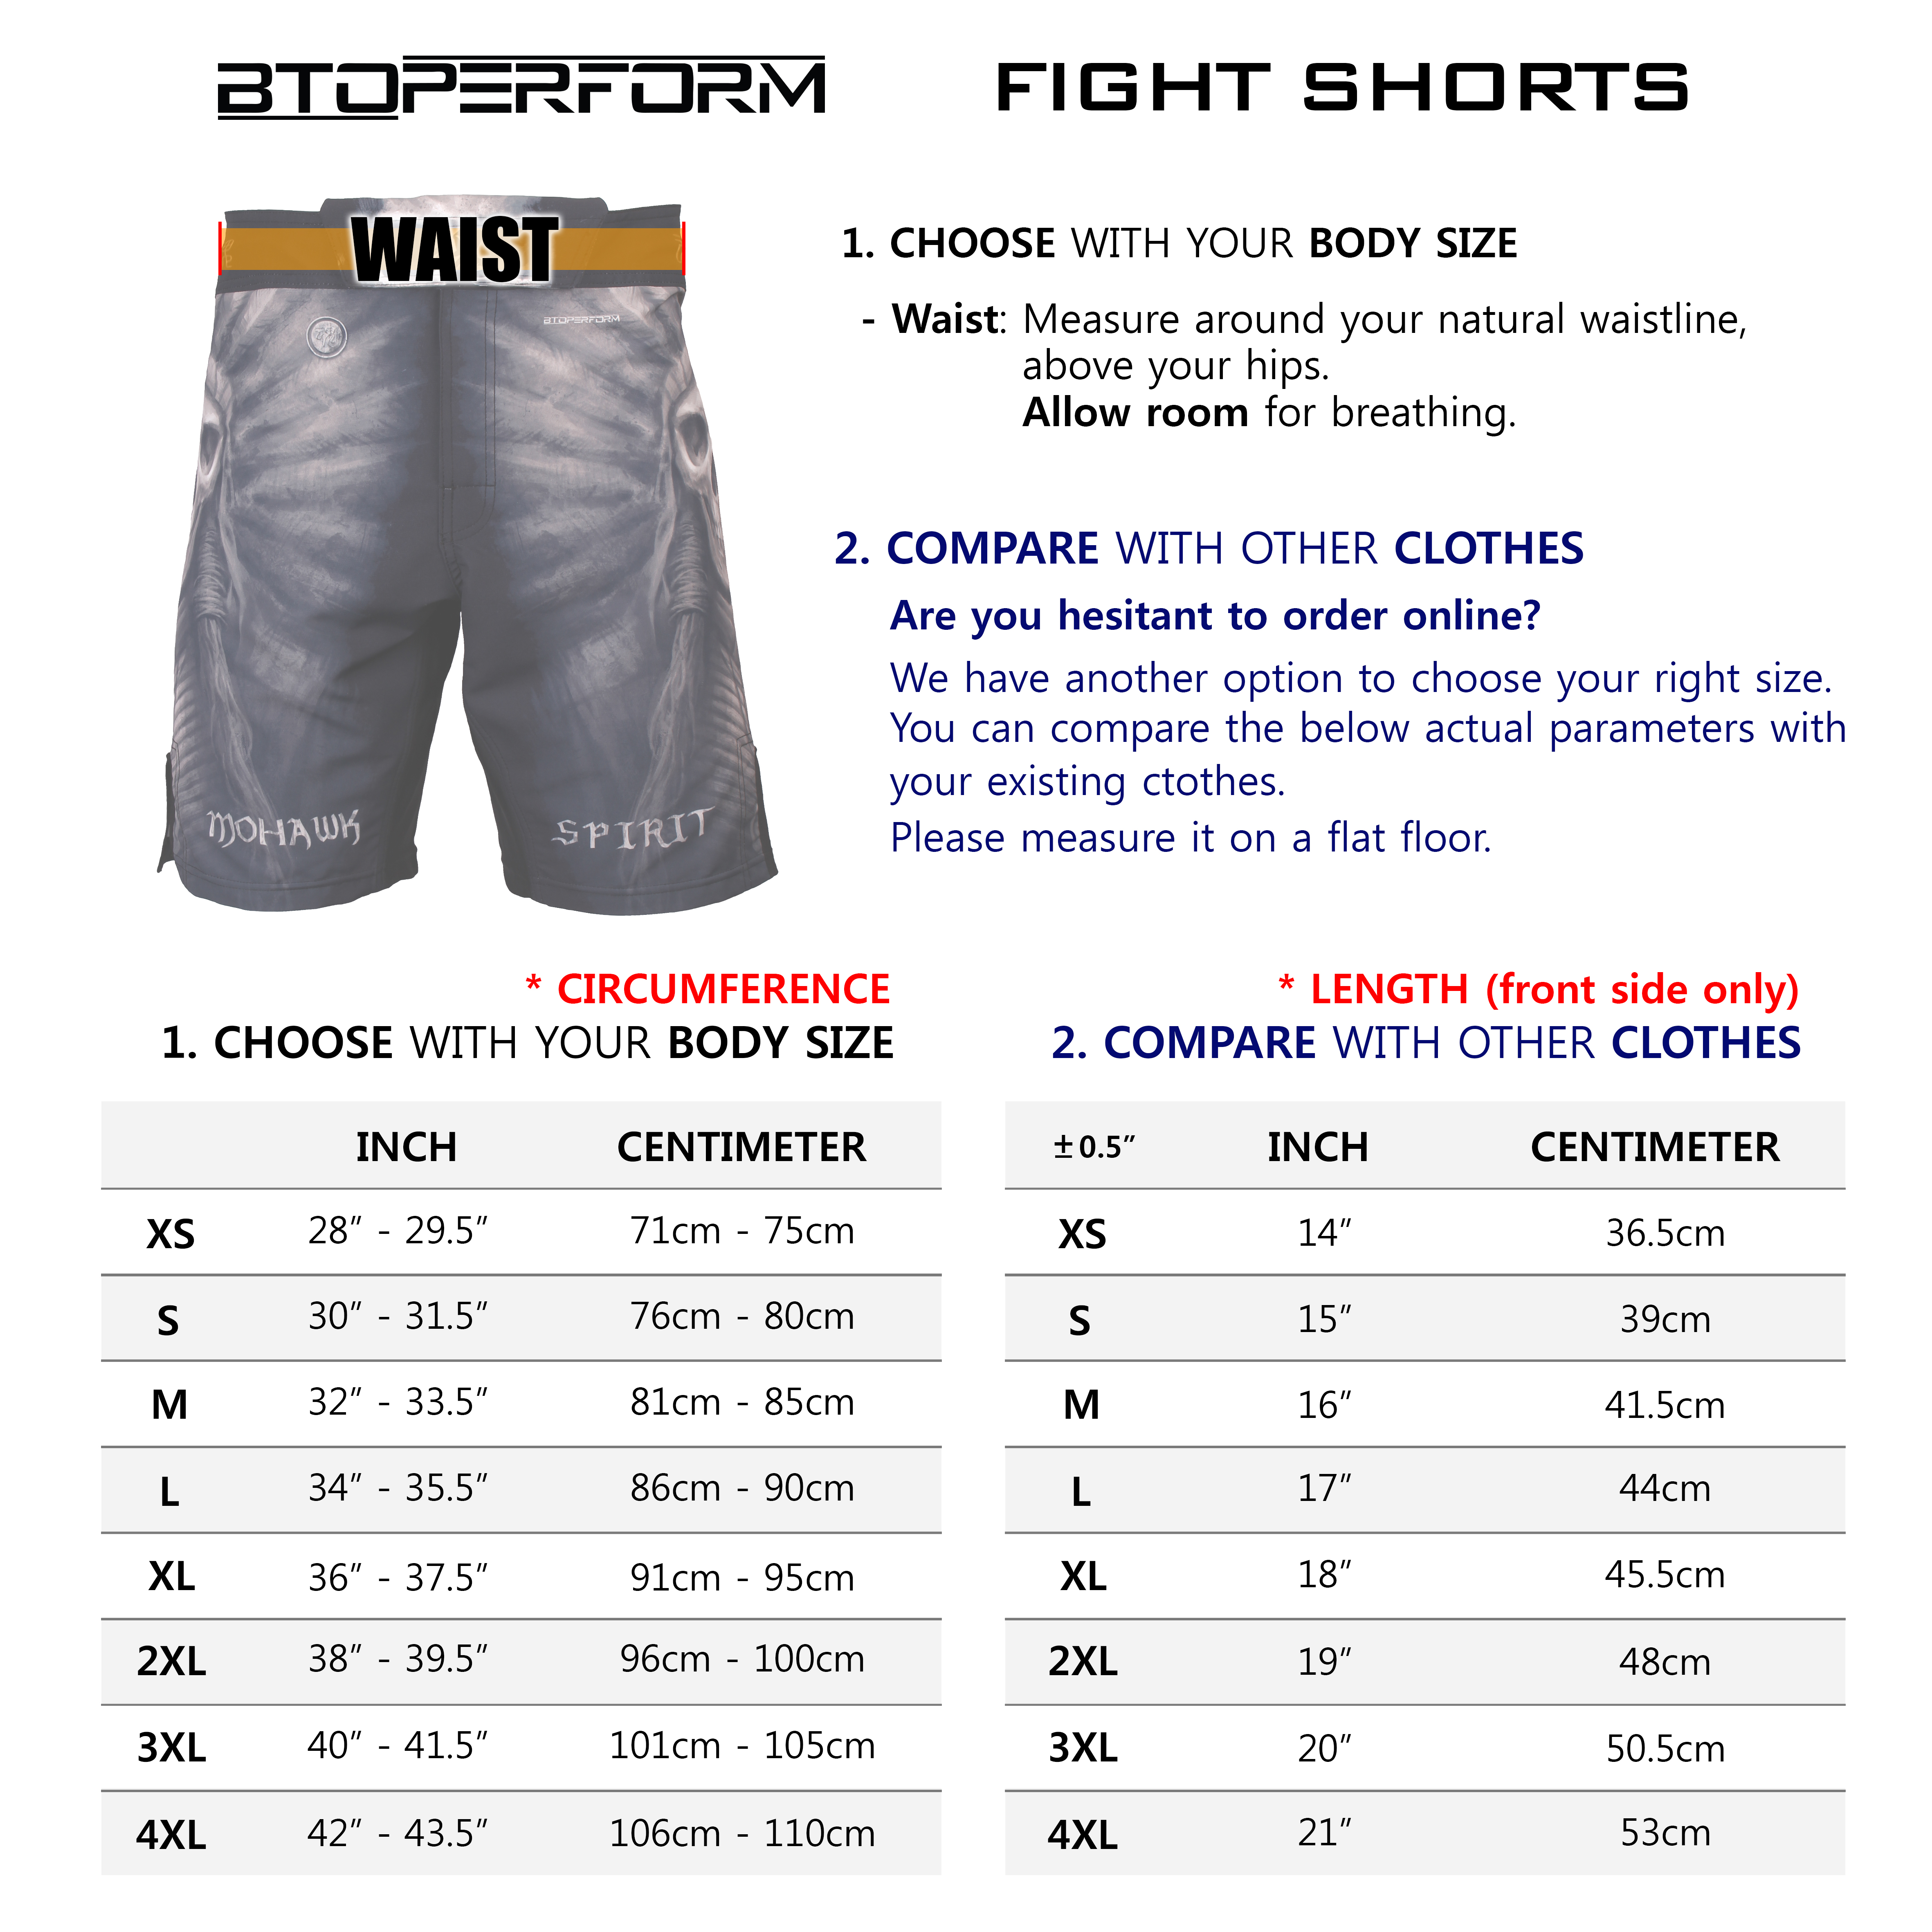 btoperform-size-chart-fight-short-mma-trunk-1.jpg